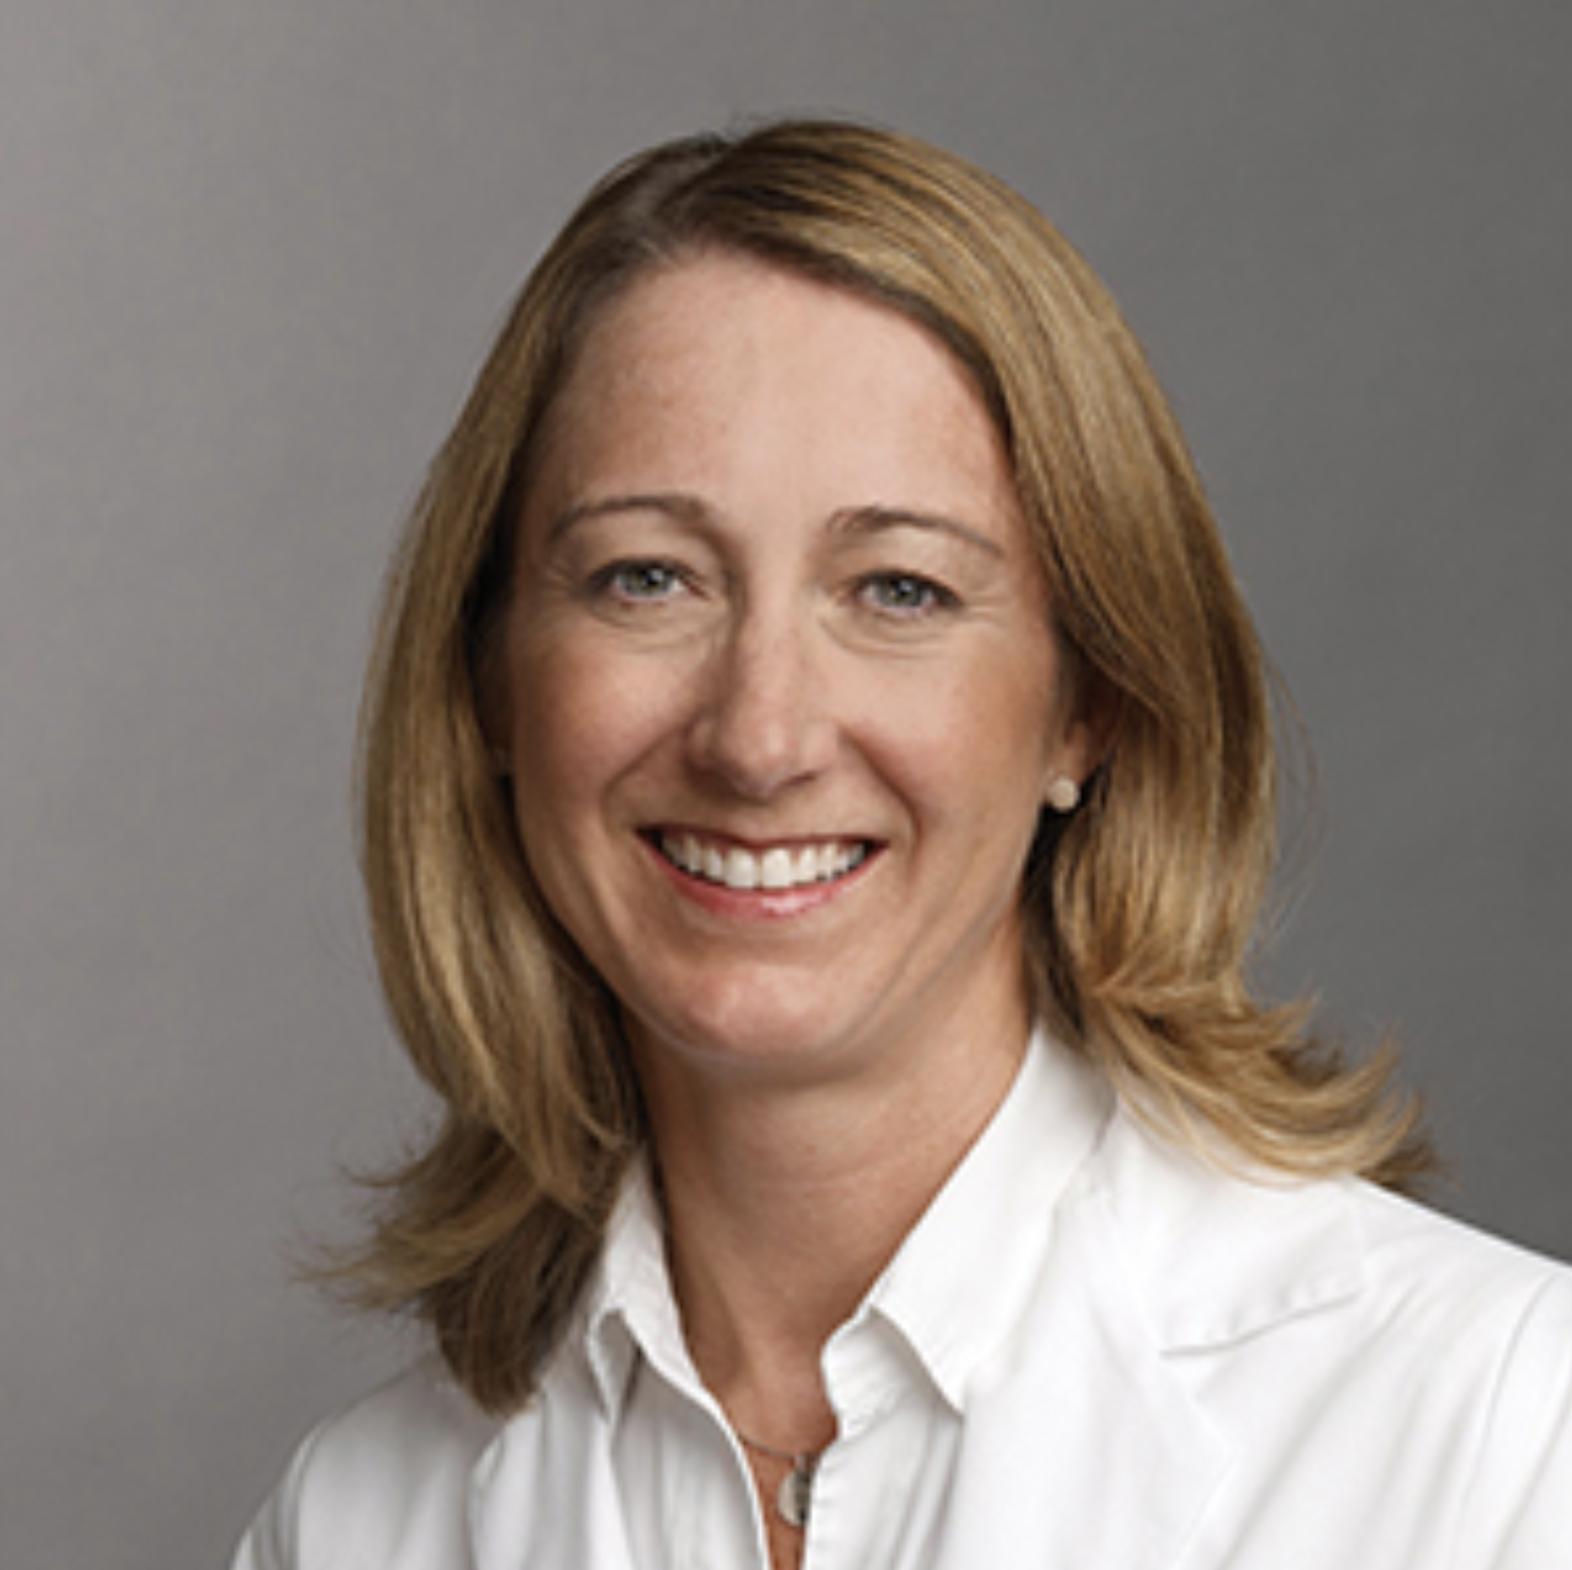 Dr. Lisa Chamberlain, Associate Professor of Pediatrics